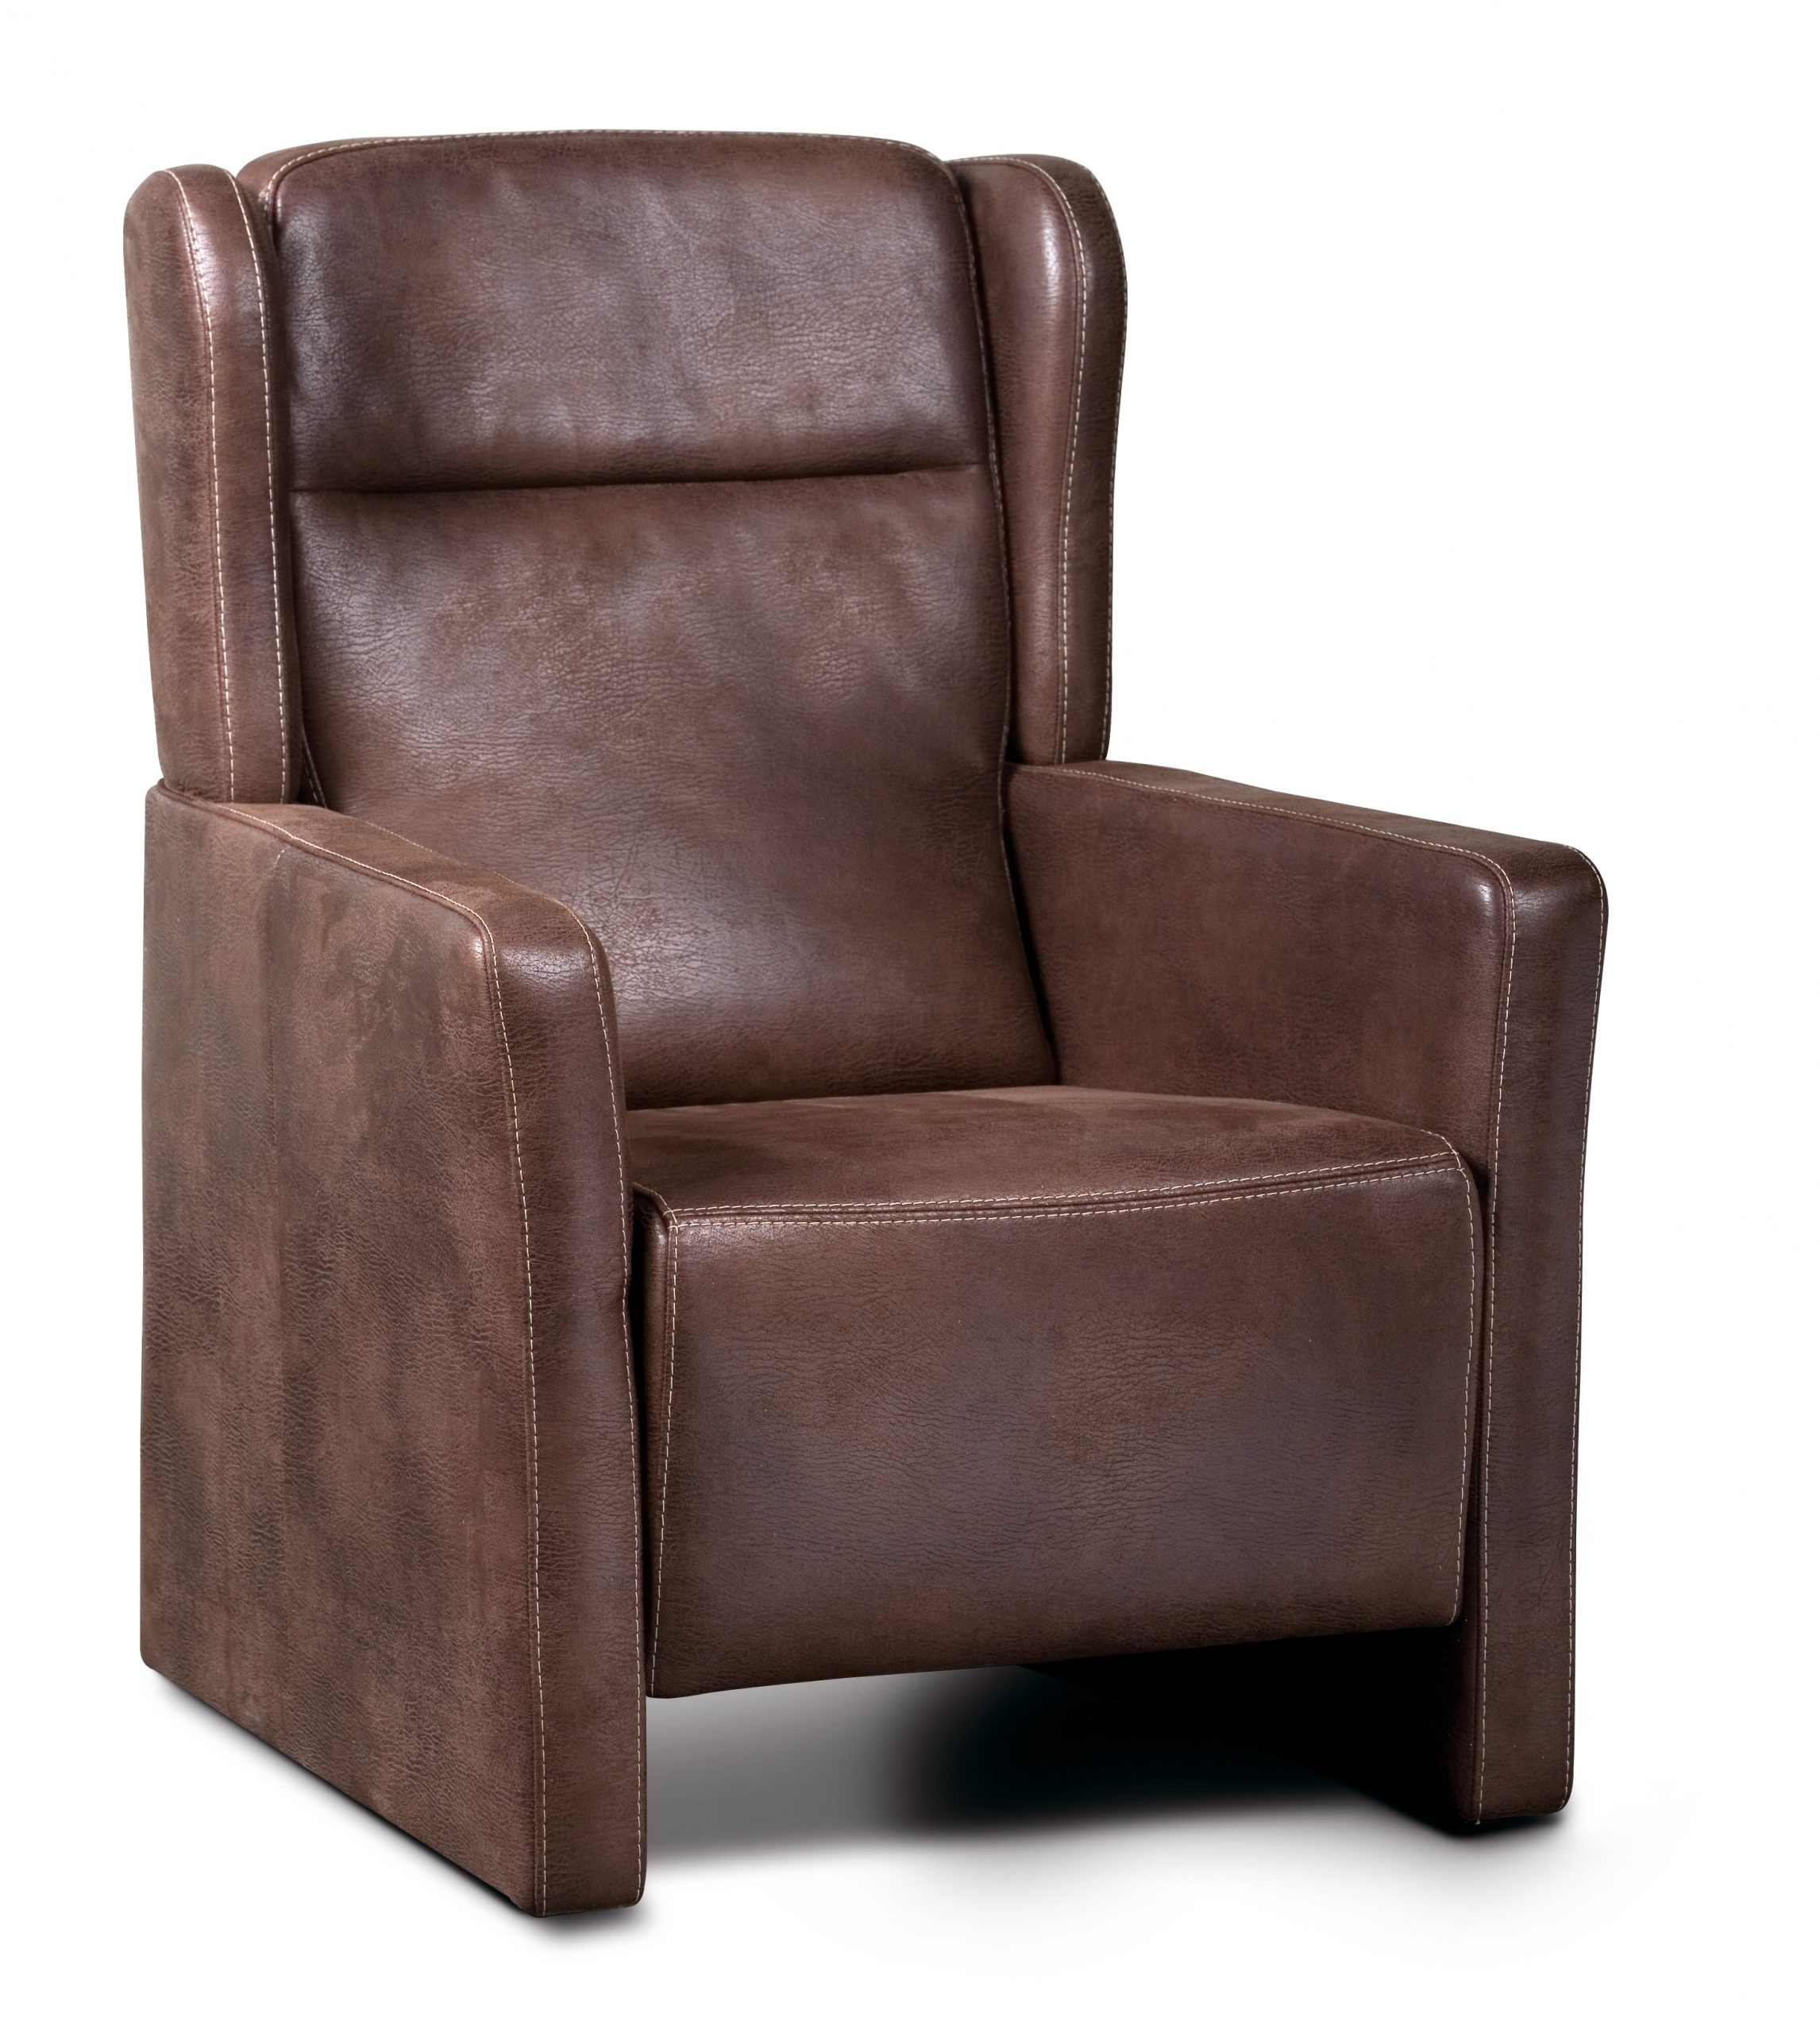 fauteuil Bryan